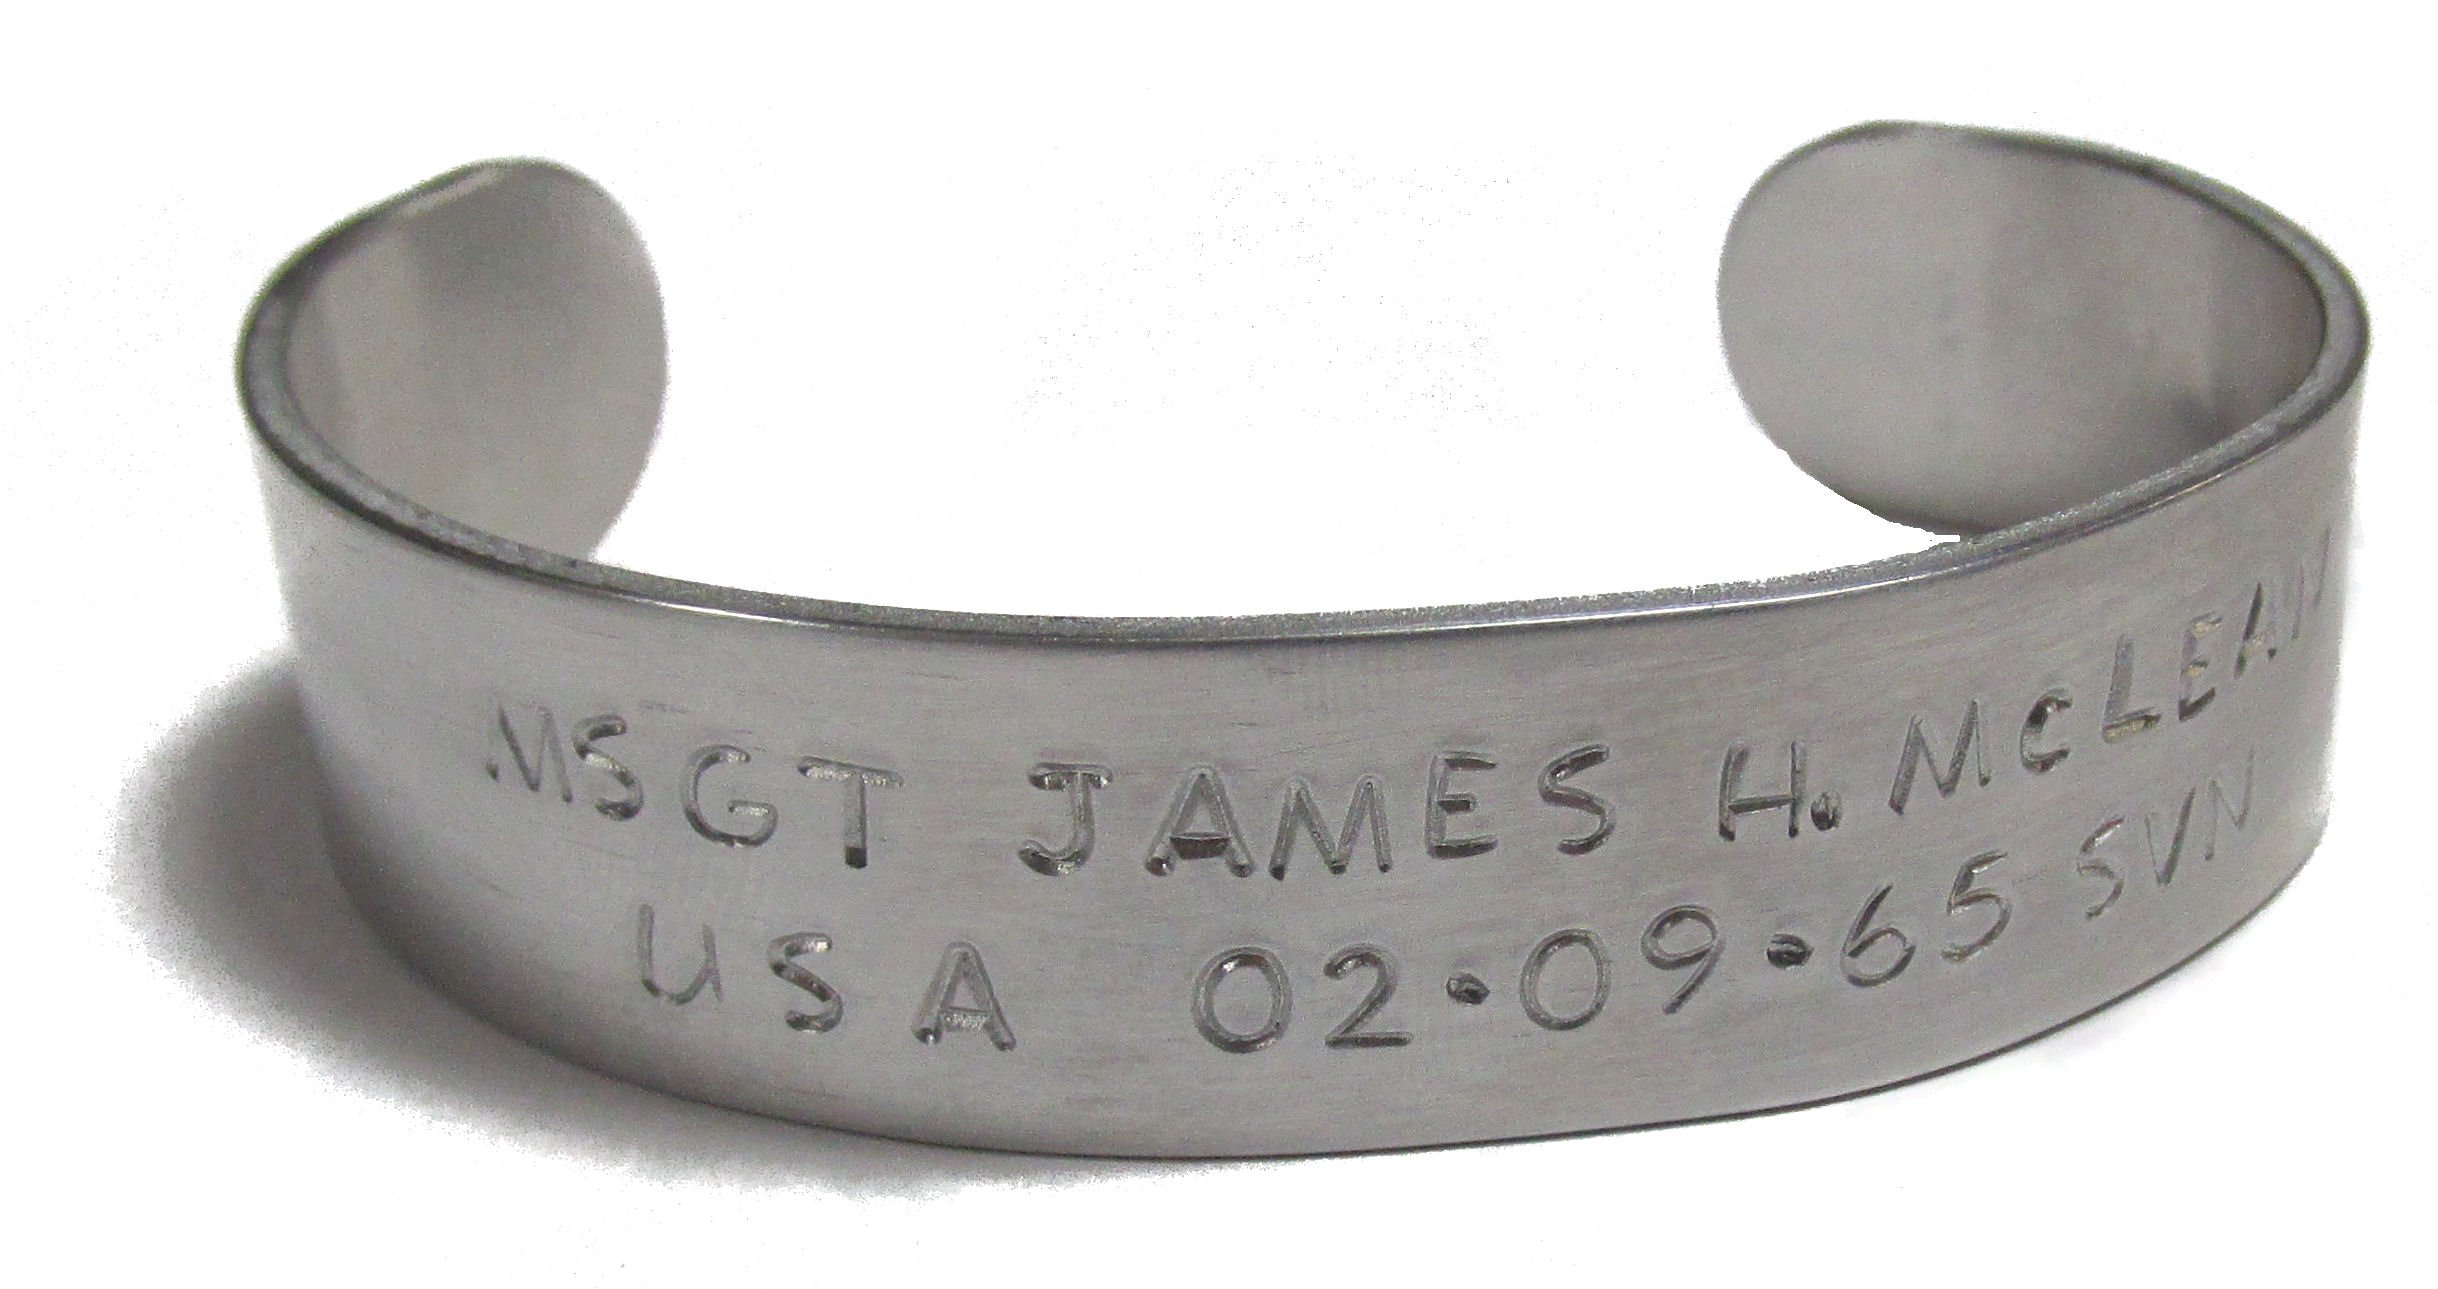 Personalized Aluminum Cuff Bracelet - Military Memorial Bracelet